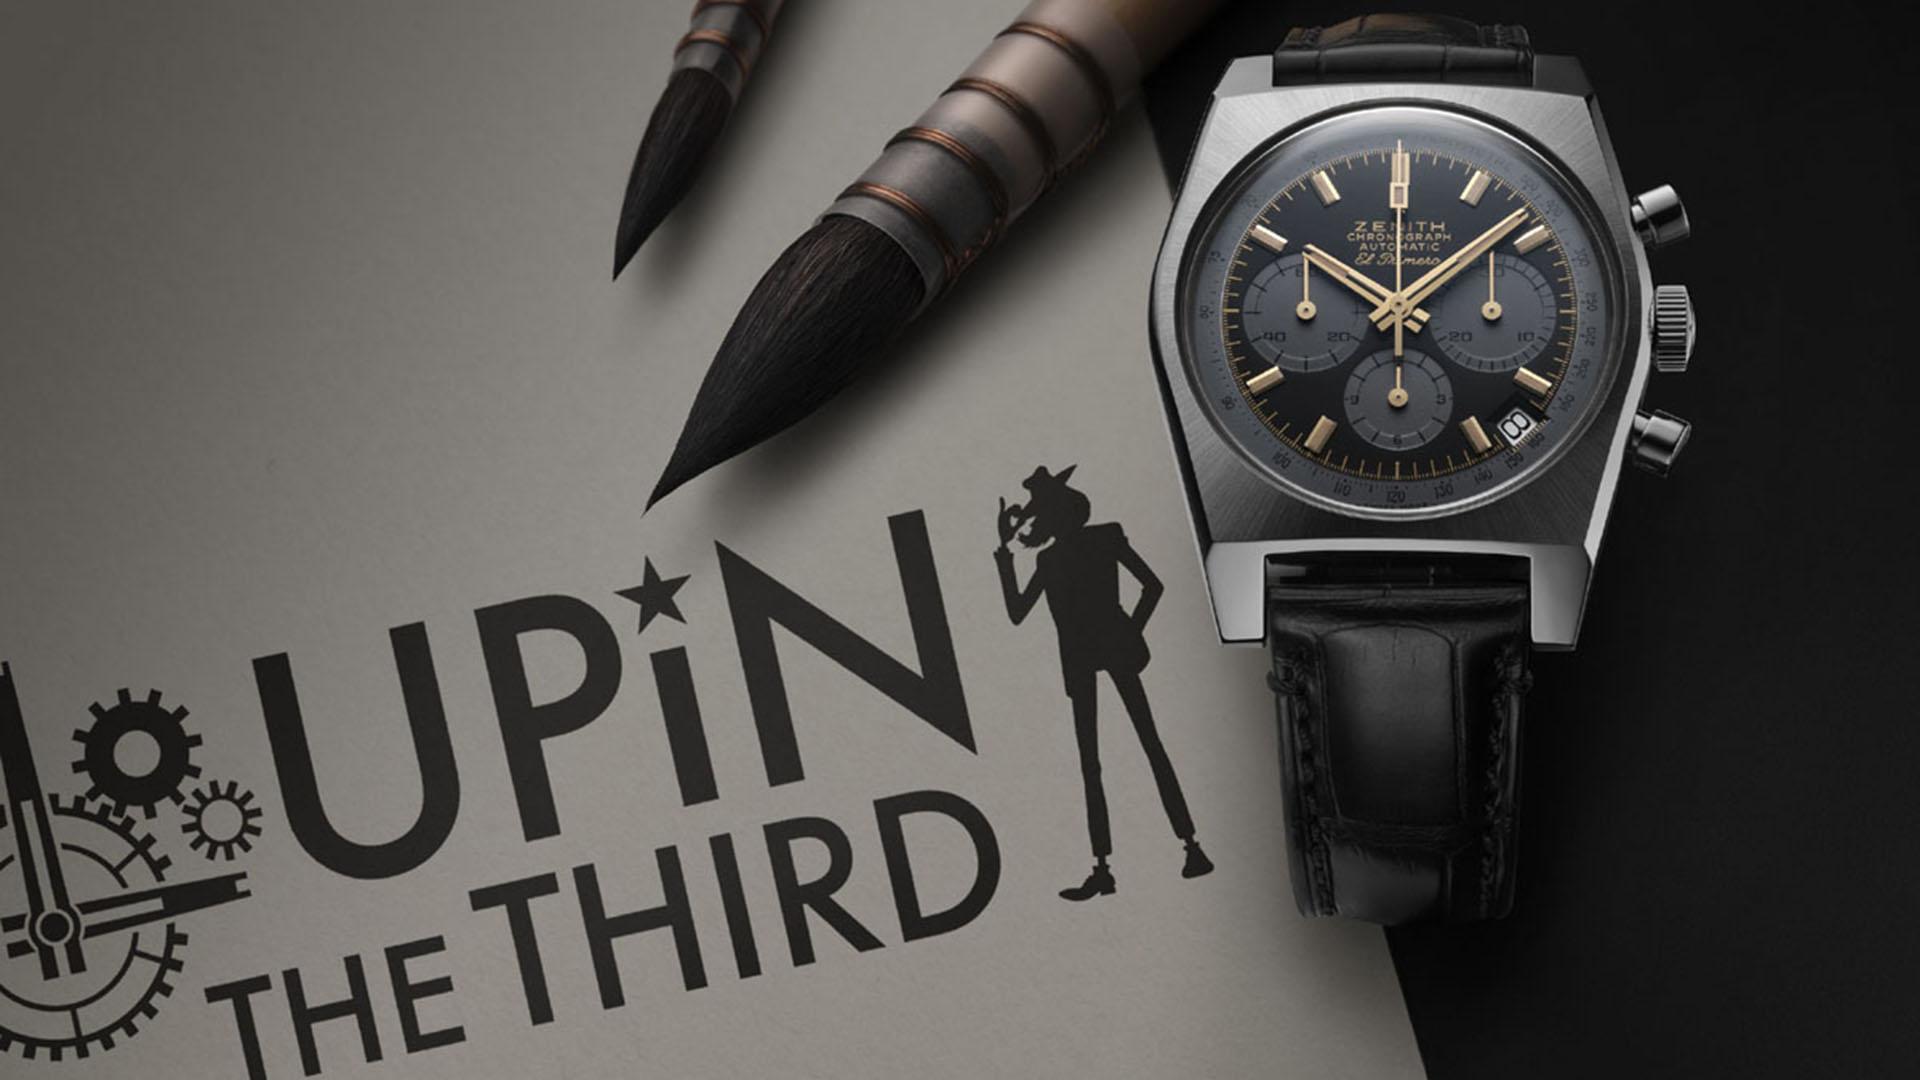 zenith-a348-jigen-lupin-III